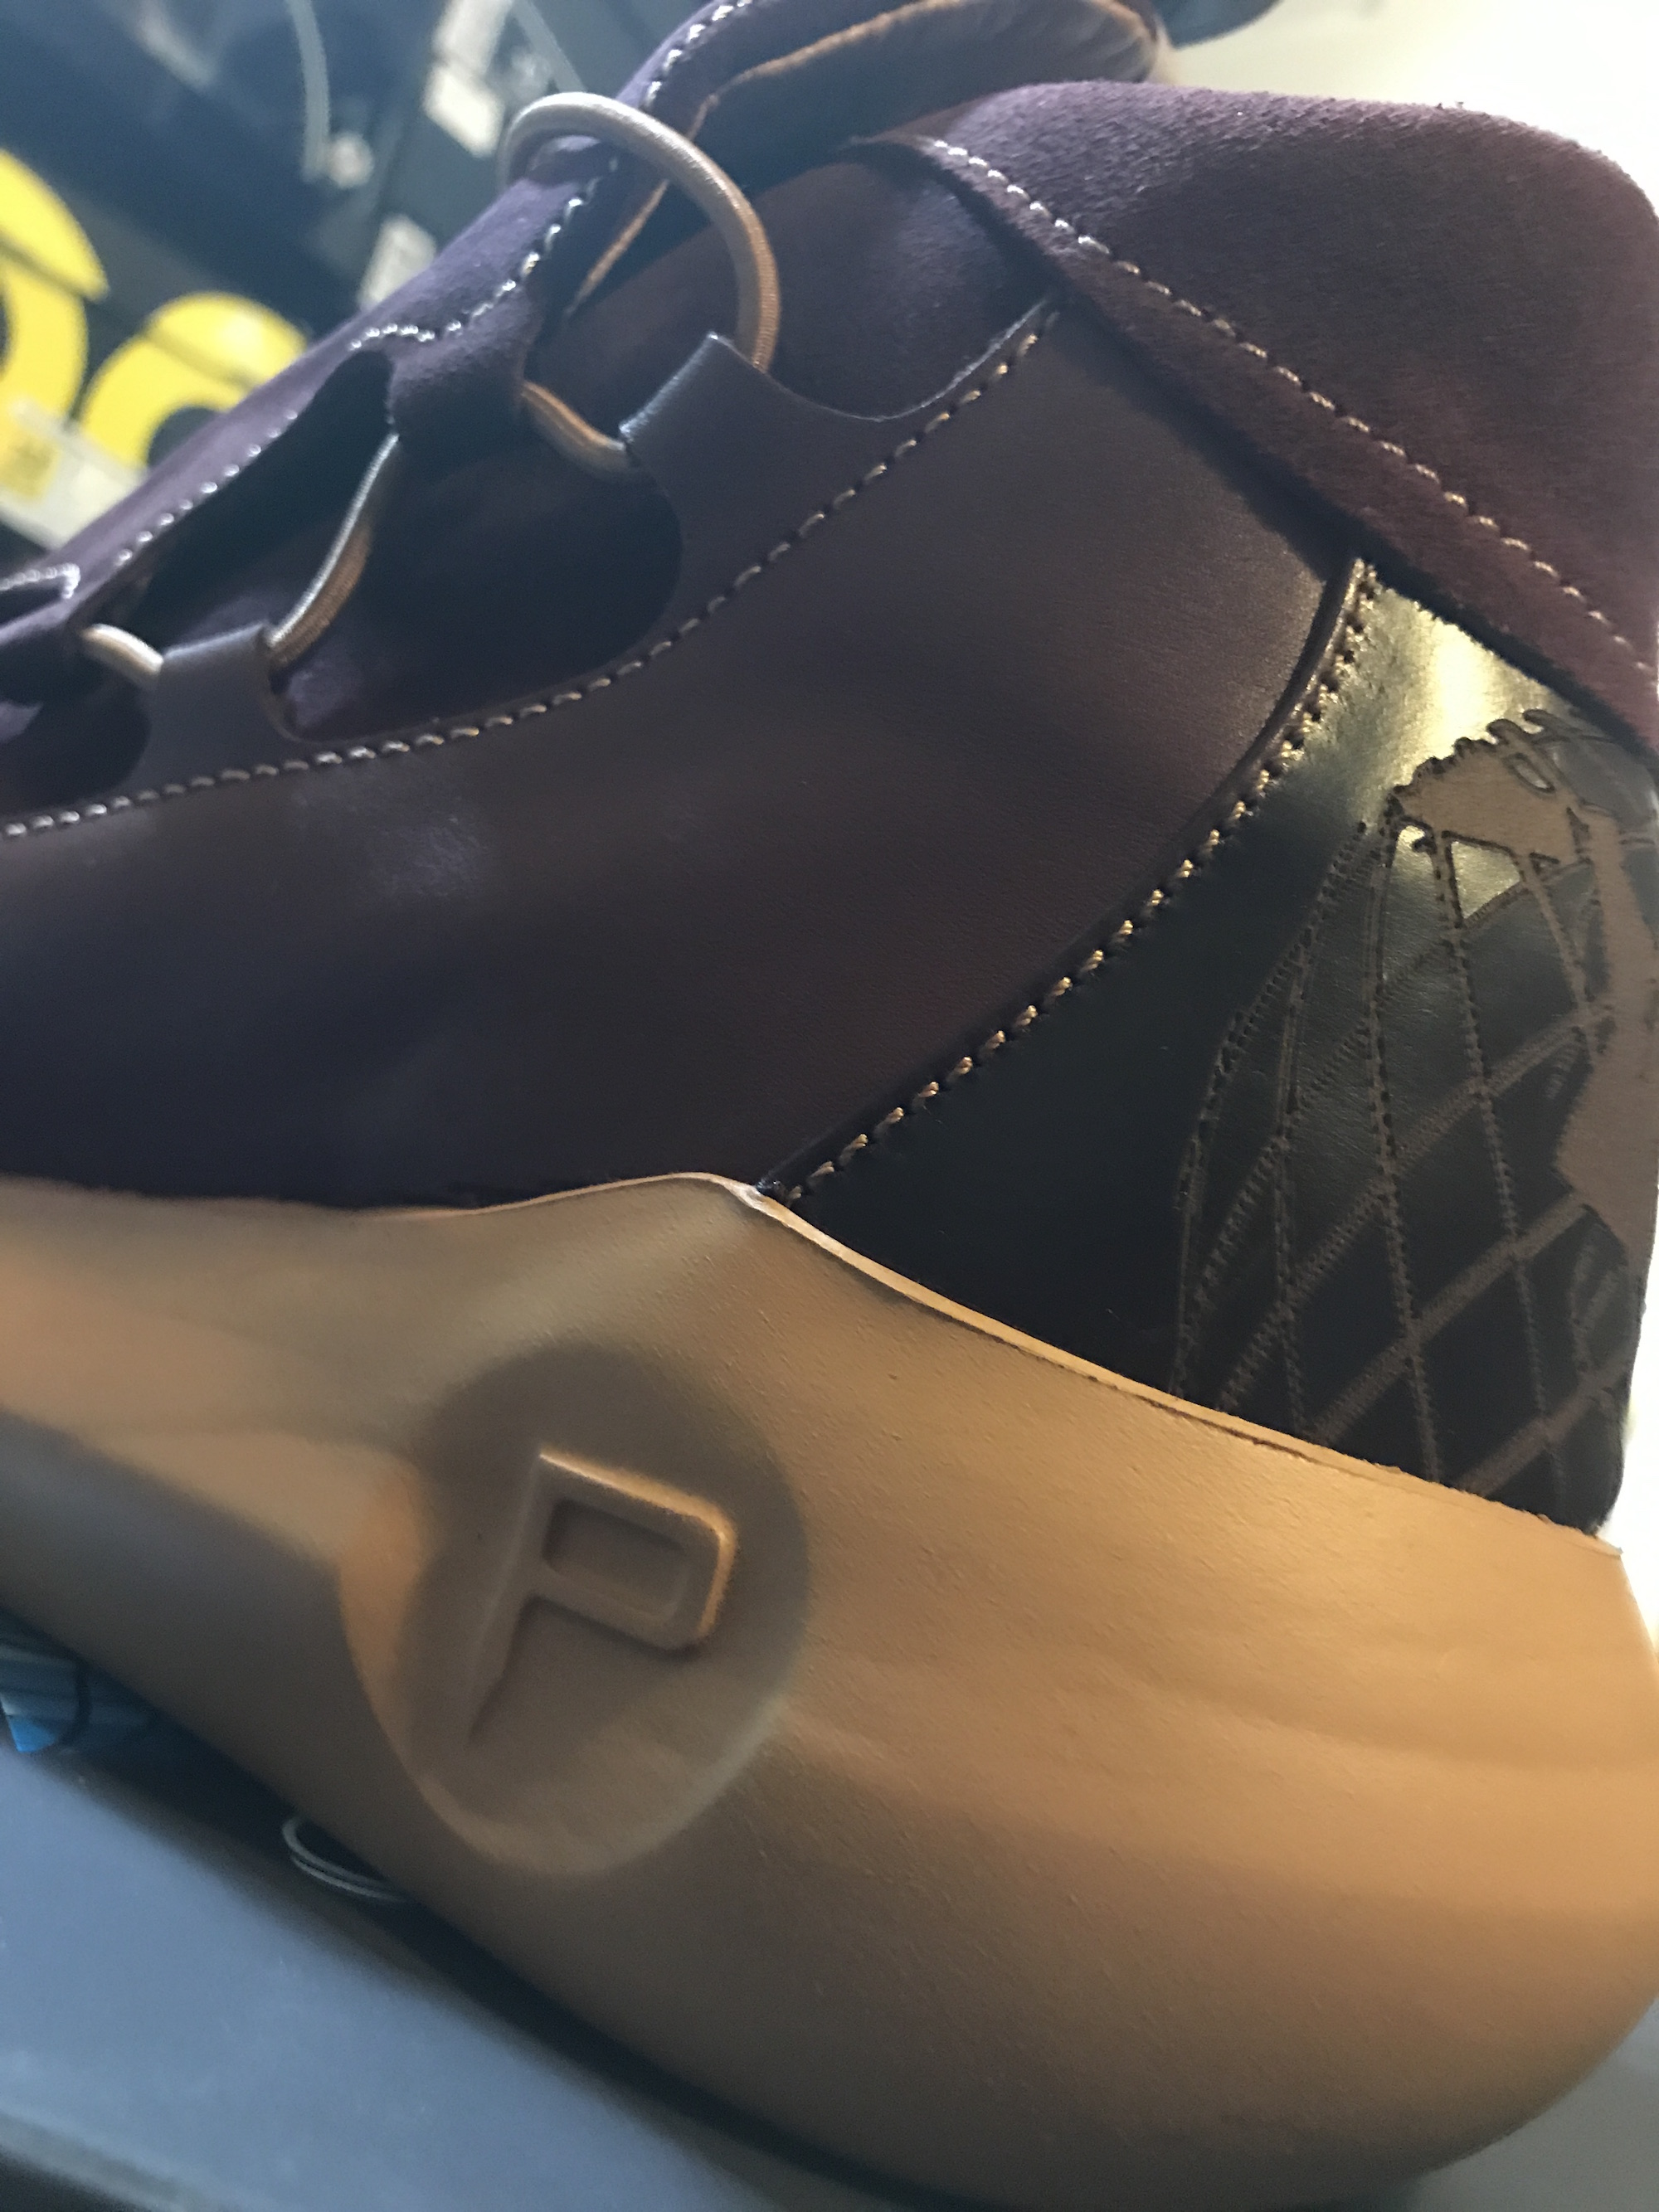 PENSOLE World Sneaker Championship maxwell lund 11